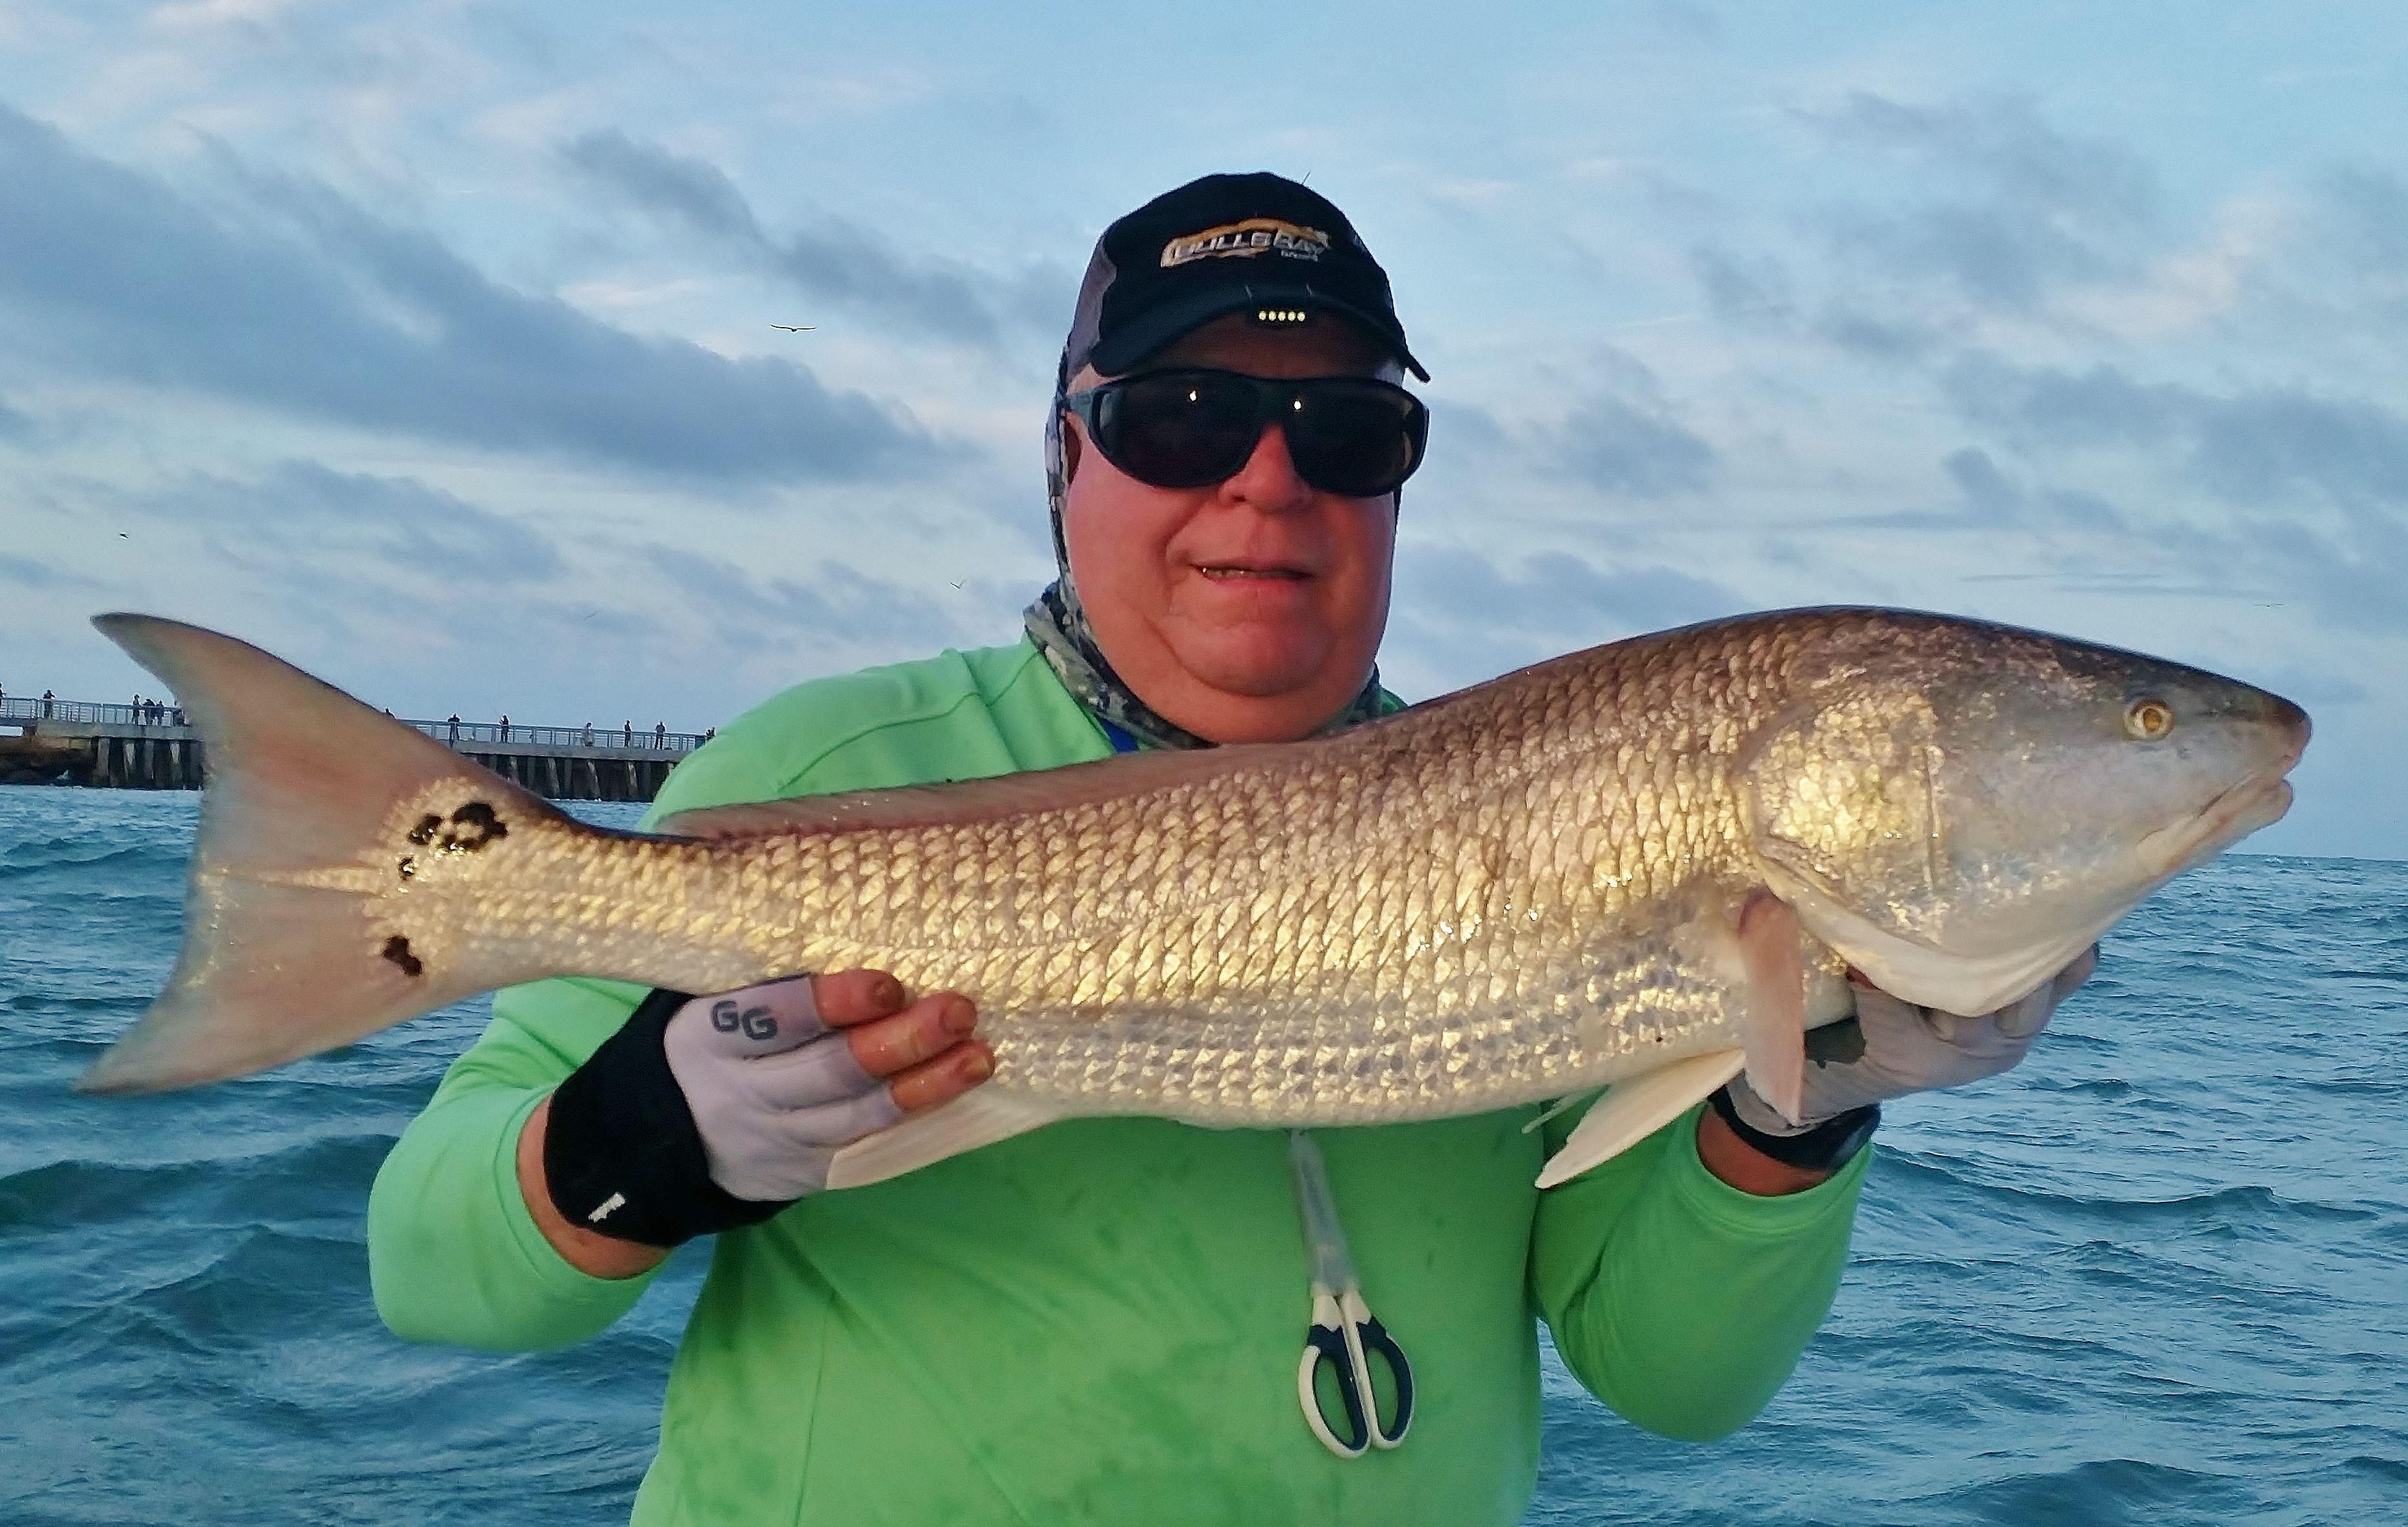 A trout goes for an unusual swim sebastian gypsy fishing for Sebastian fishing charters